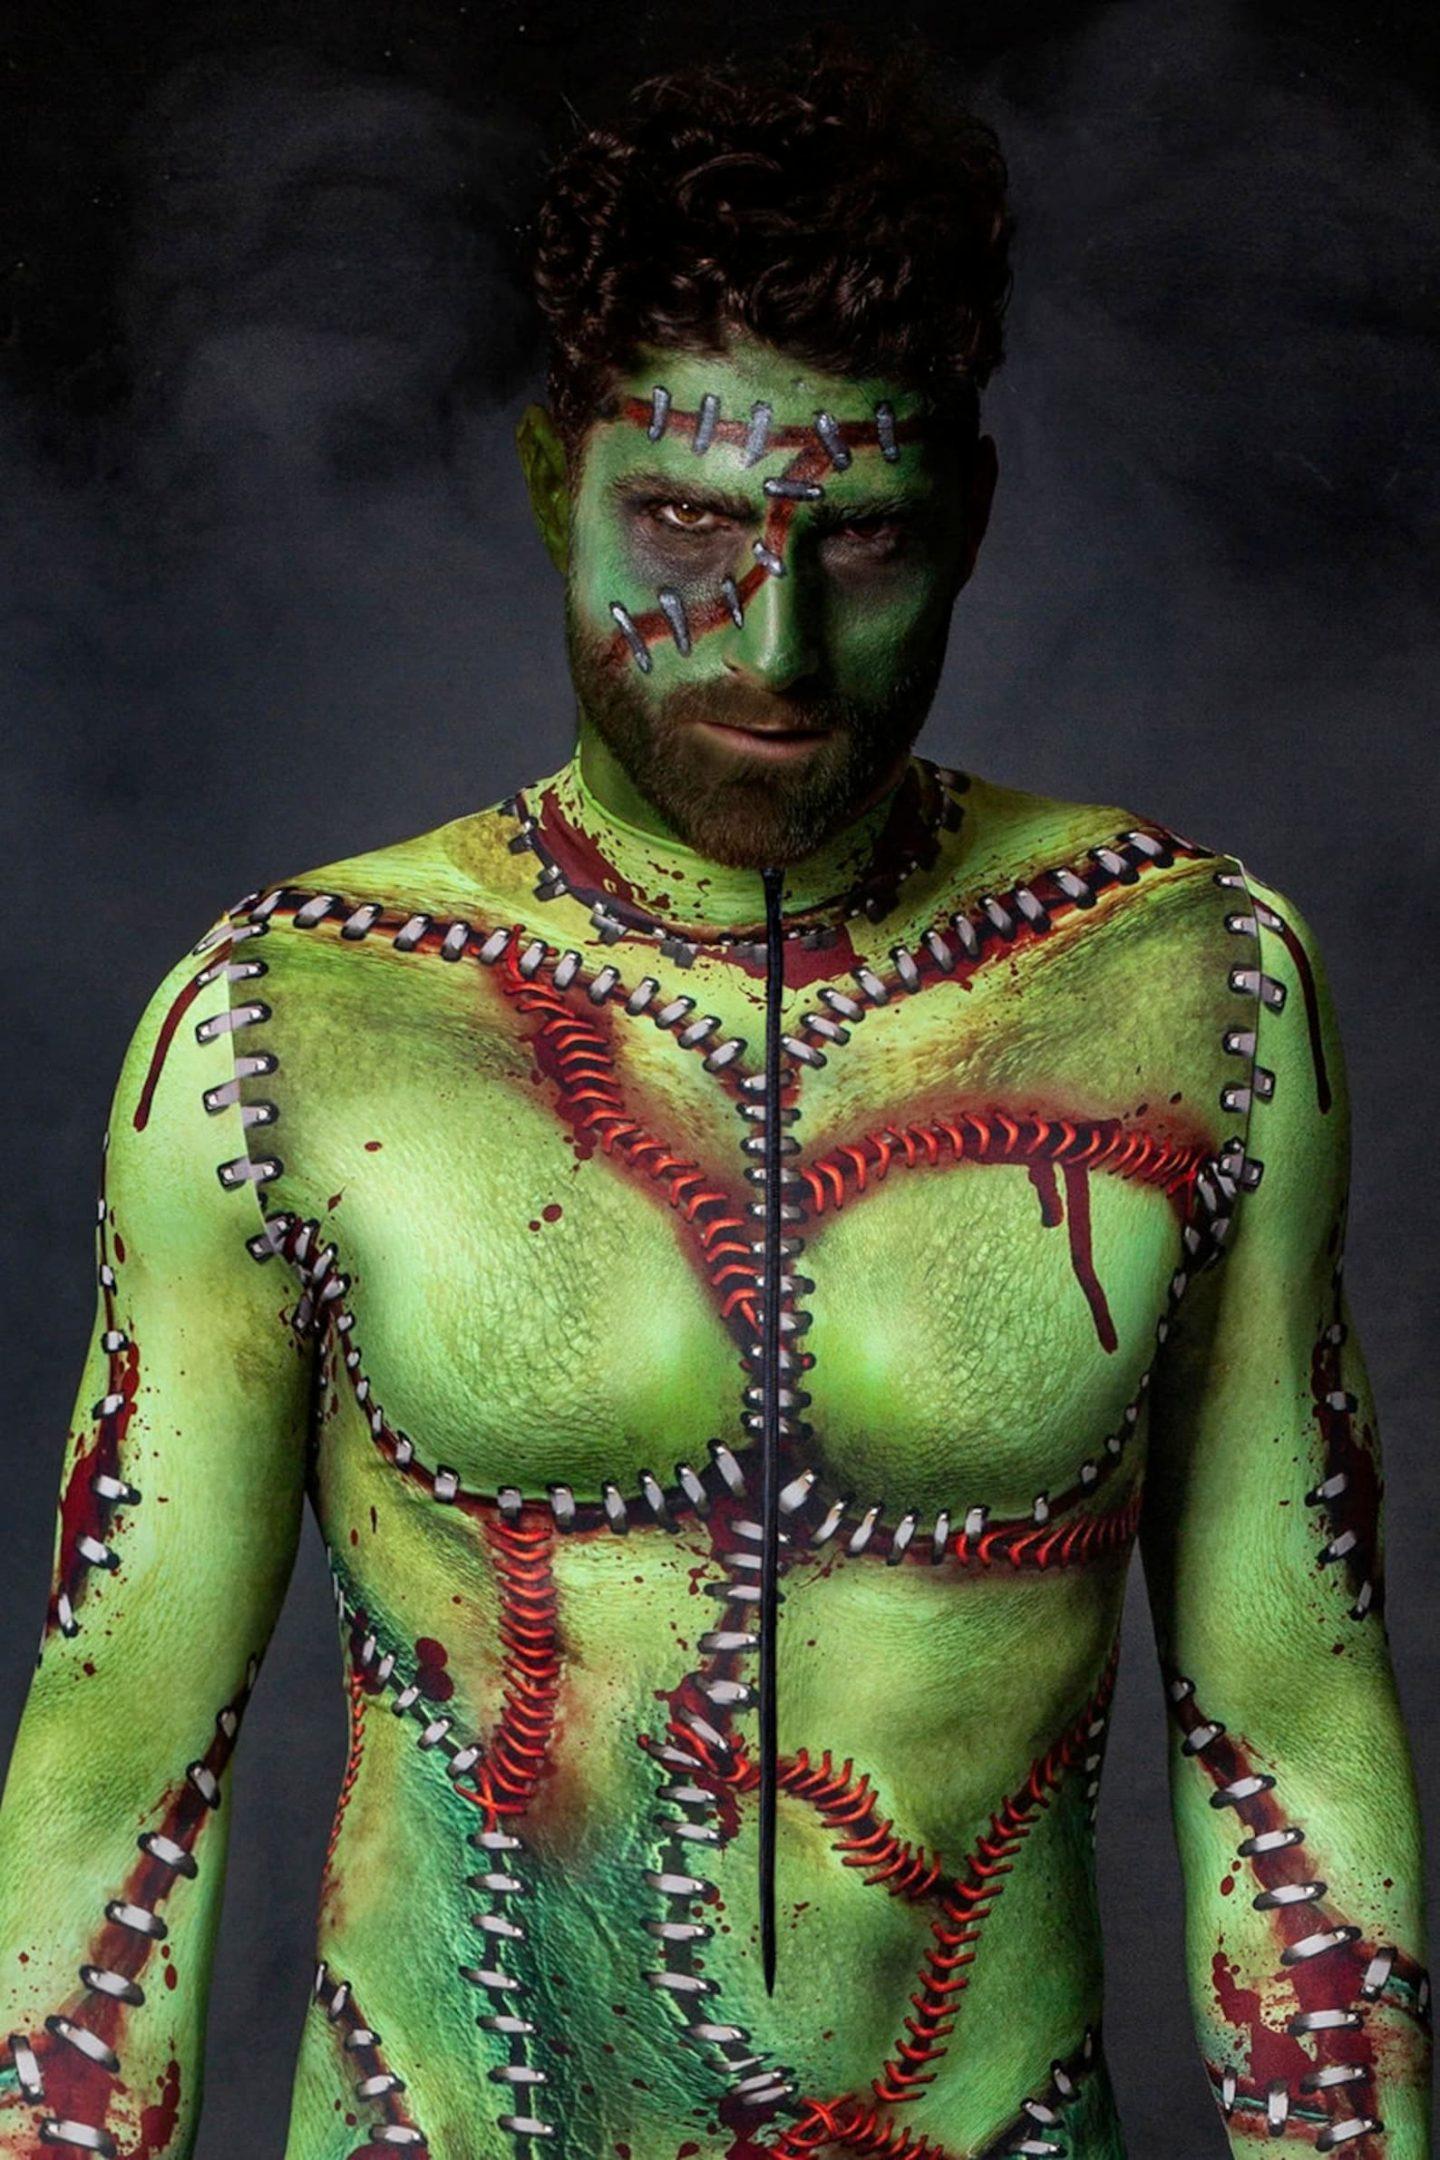 Frankenstein Halloween costume for men